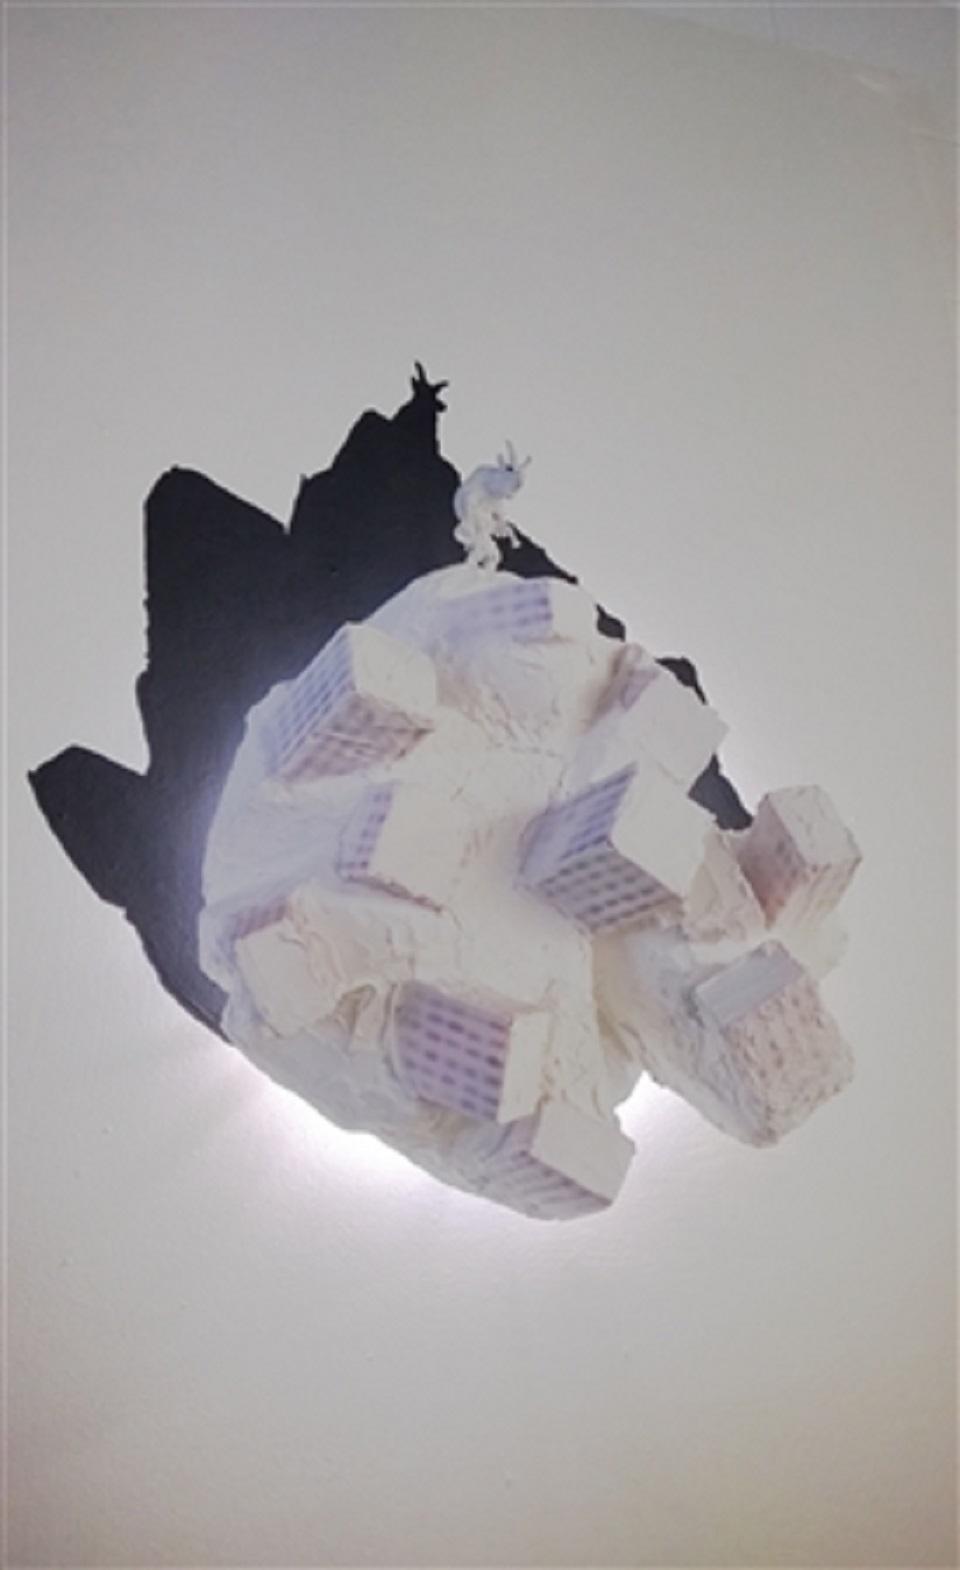 Richi Ferrero – Meteorite